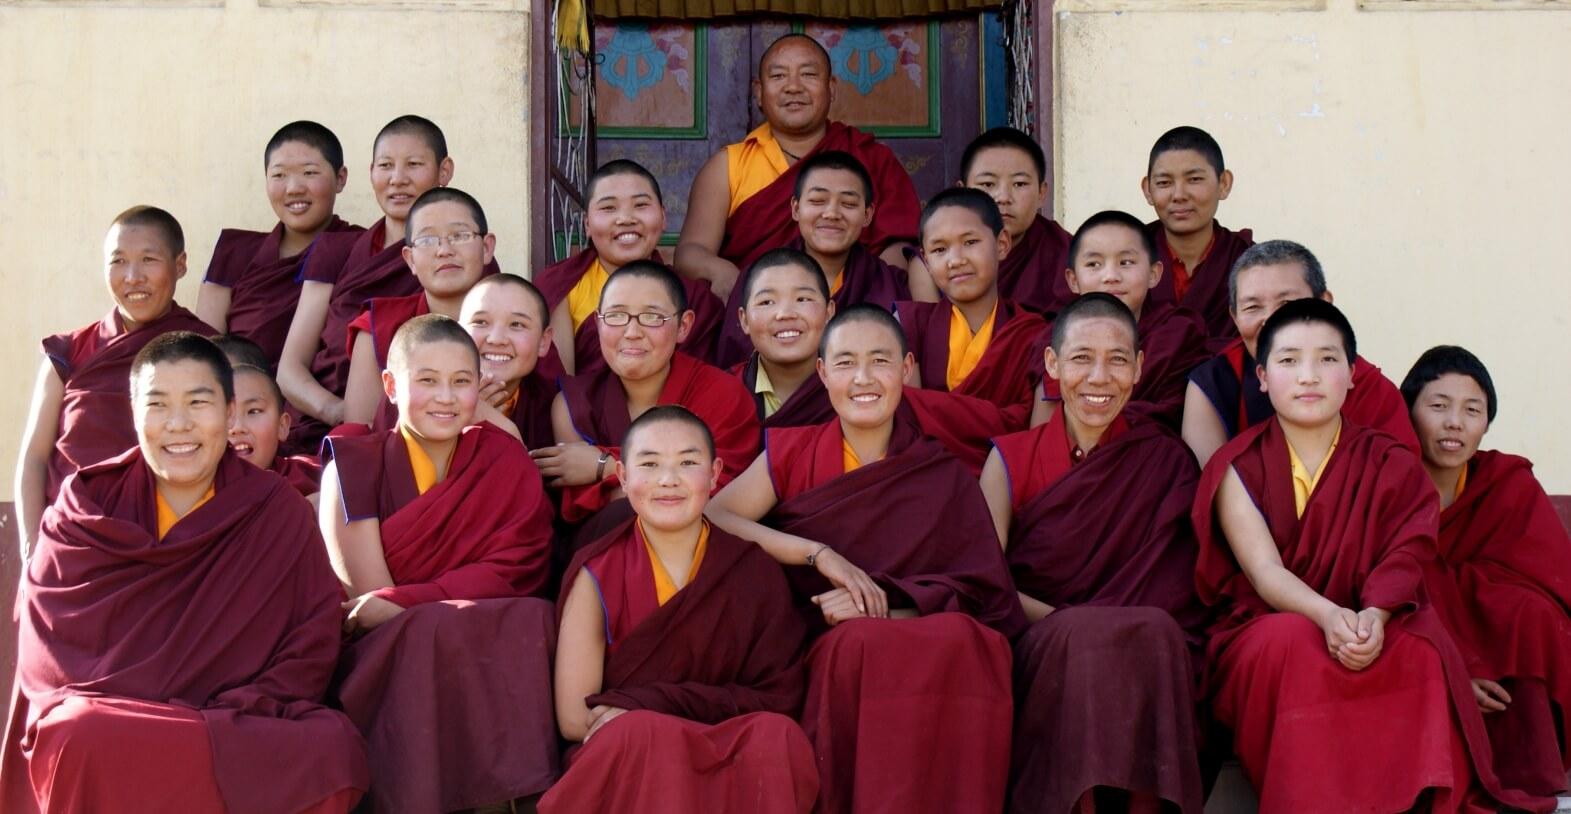 nuns-in-tibet